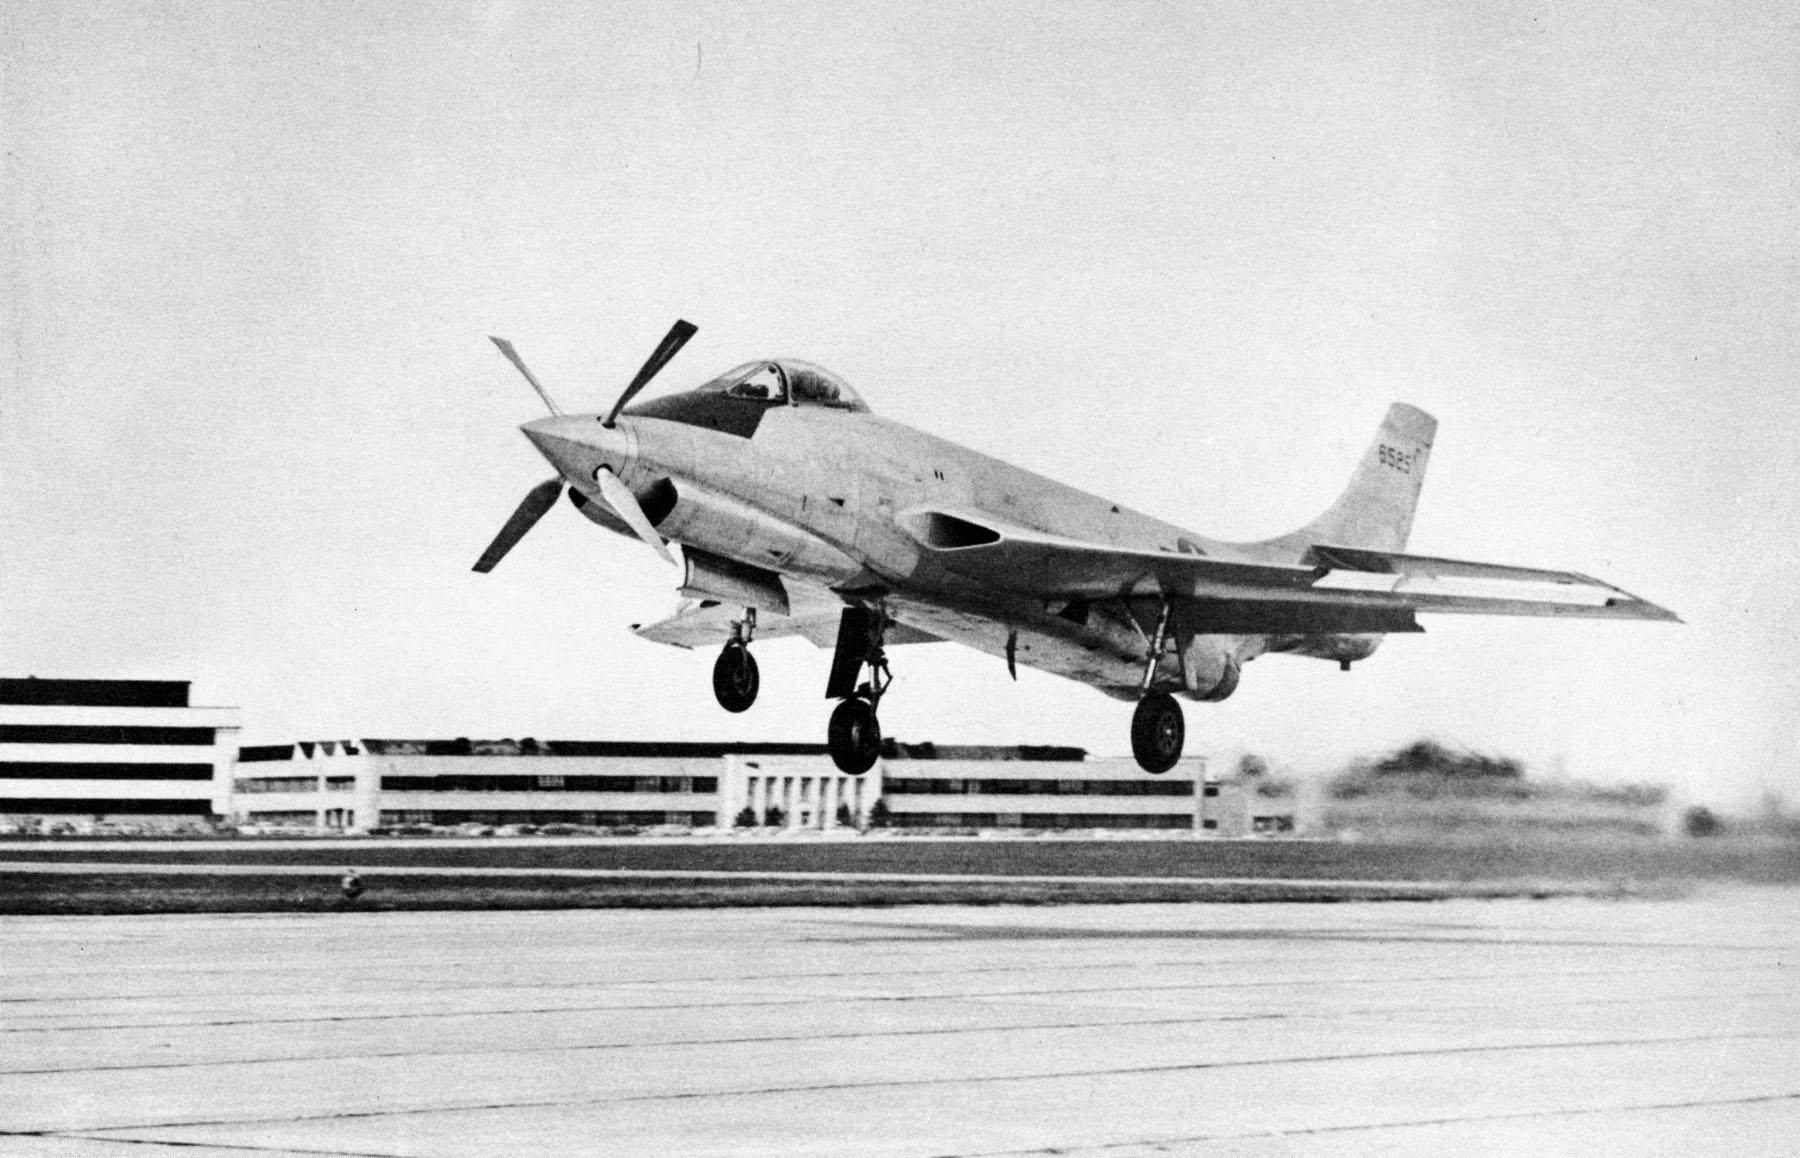 McDonnell_XF-88B_(SN_46-525)_turboprop_l